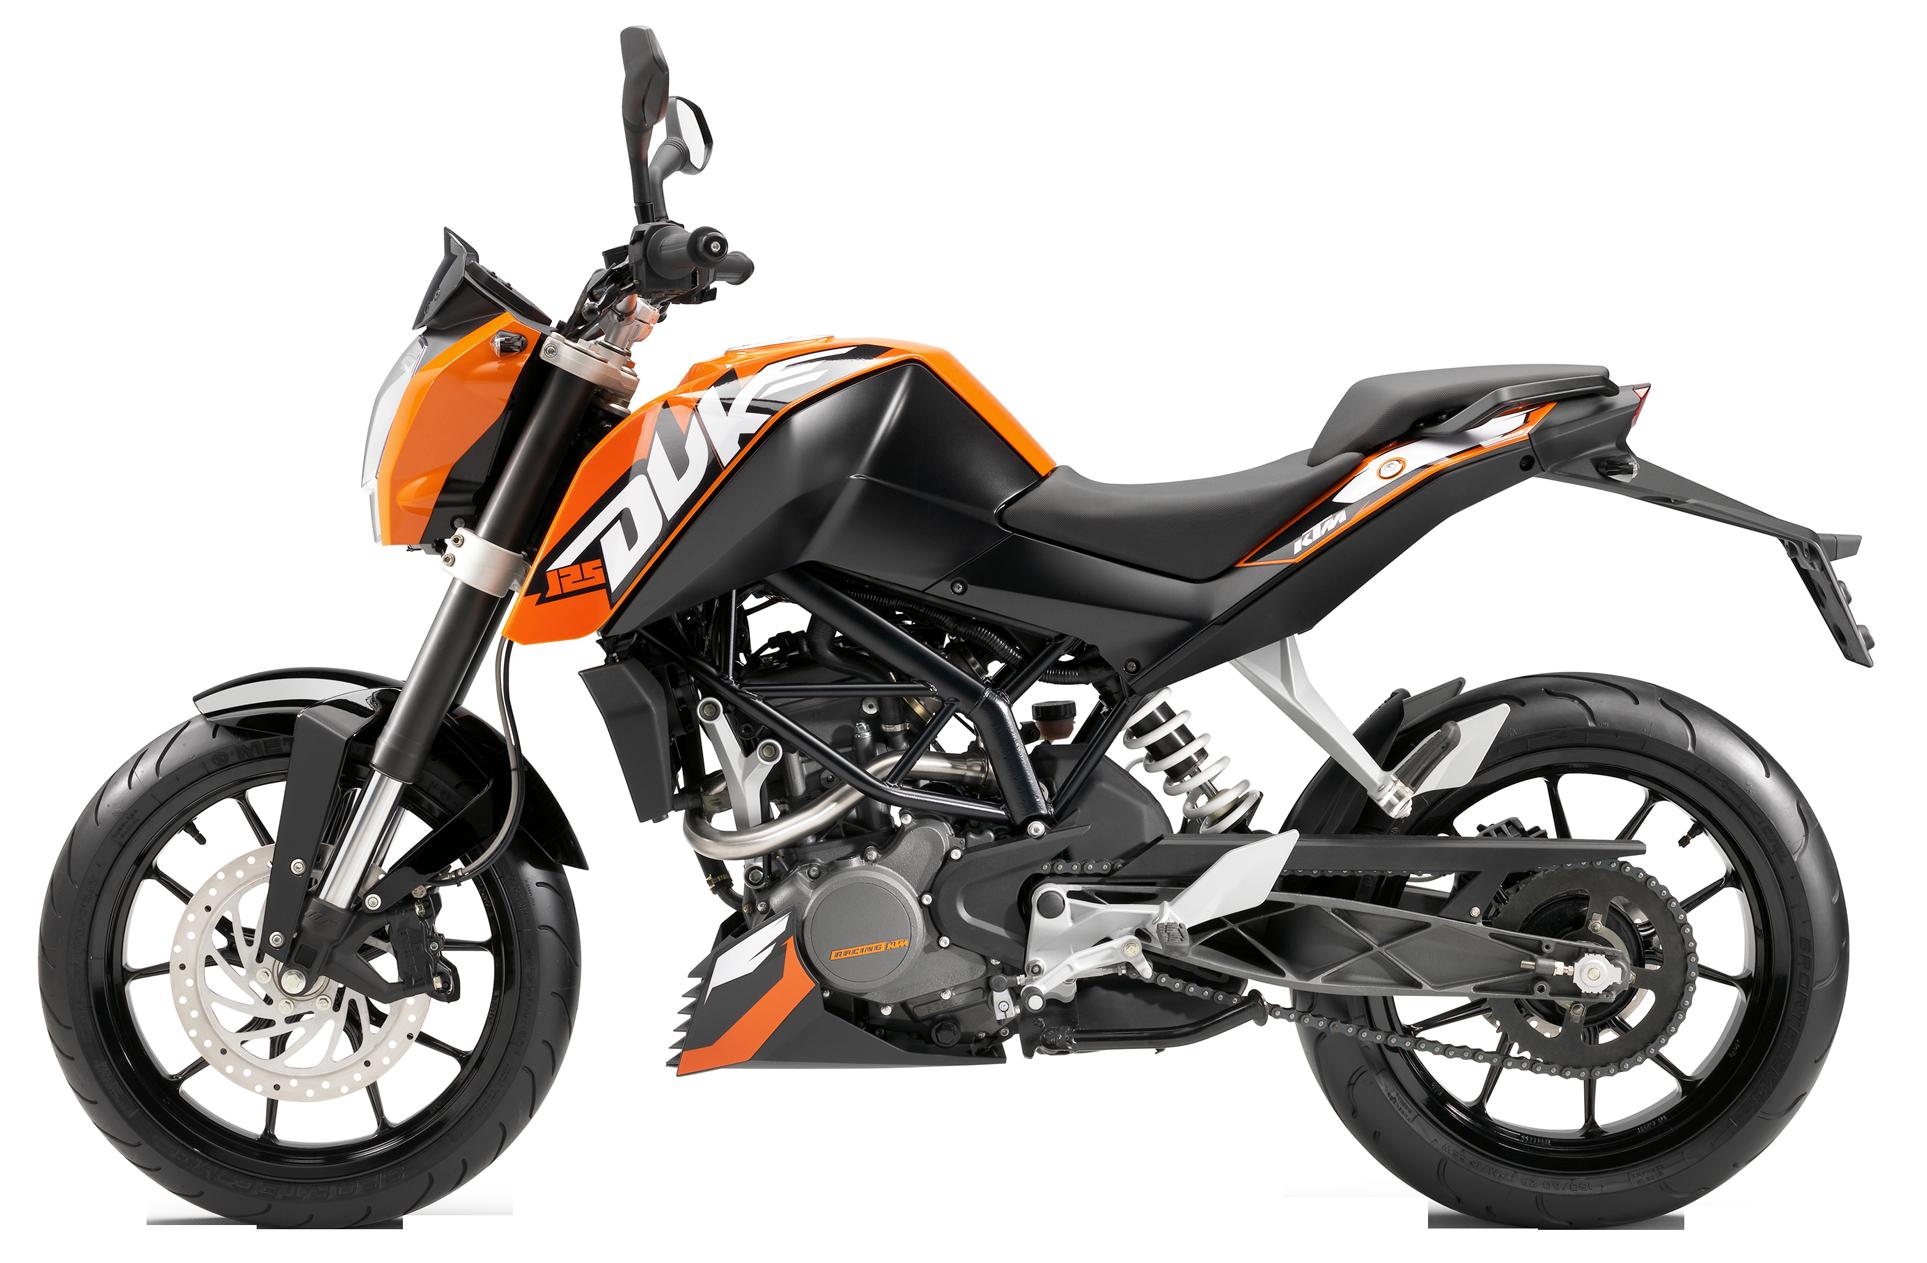 Ktm duke sports png. Motorcycle clipart bullet bike